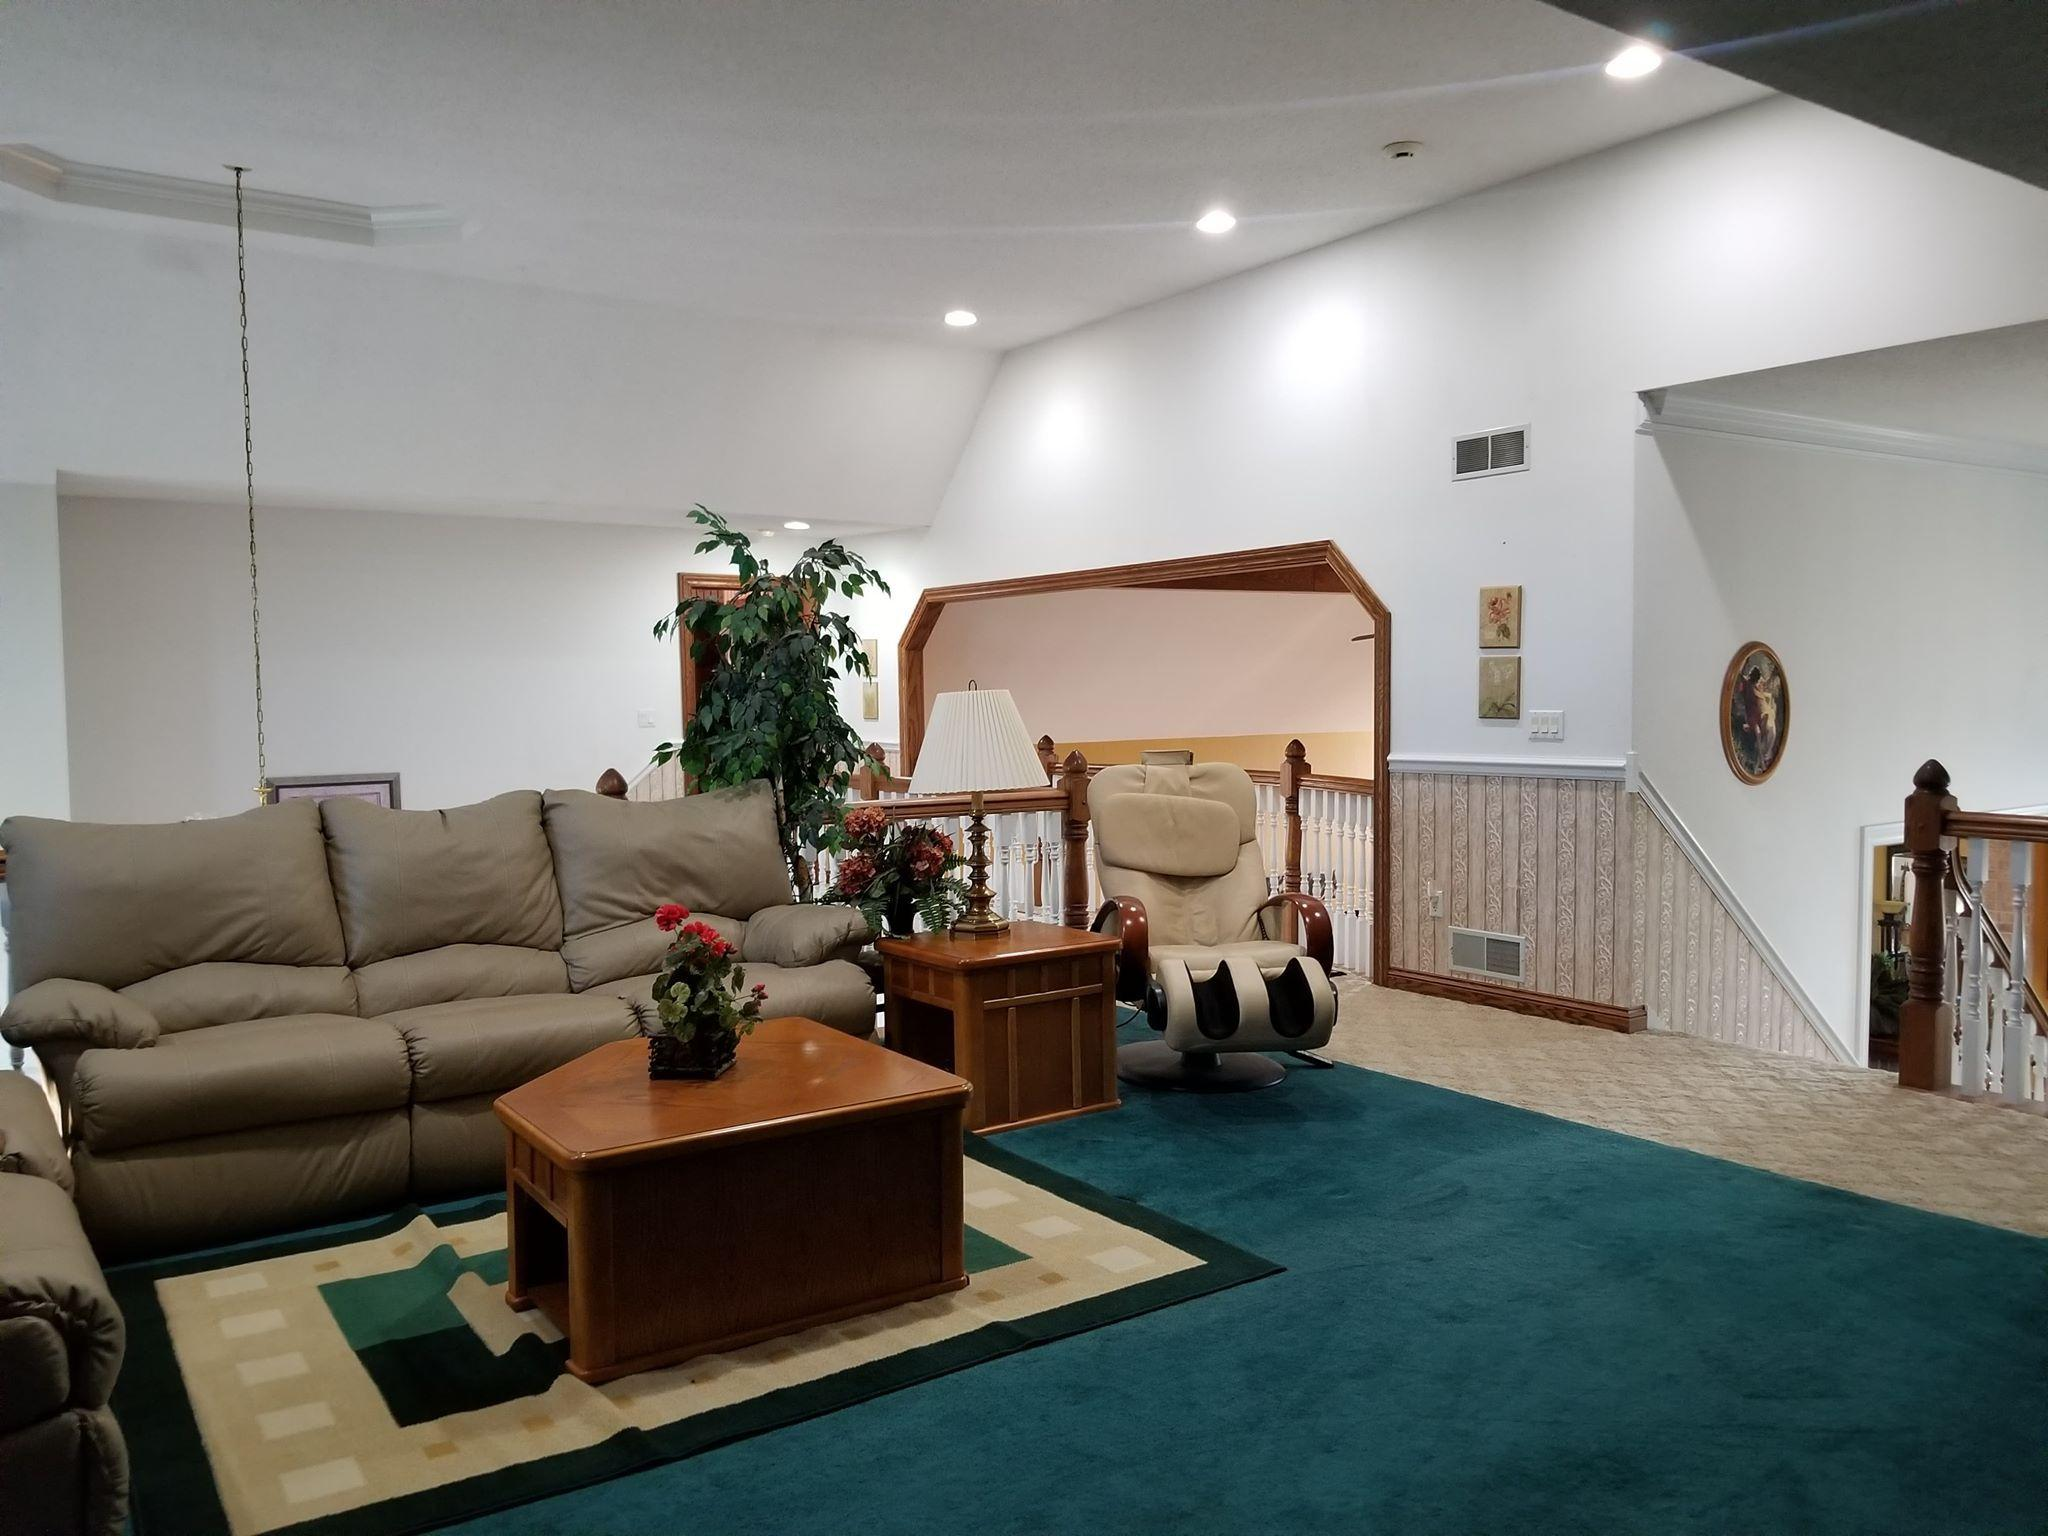 18990 Coffee Rd, New Berlin, Wisconsin 53146, 5 Bedrooms Bedrooms, 13 Rooms Rooms,4 BathroomsBathrooms,Single-family,For Sale,Coffee Rd,1663592